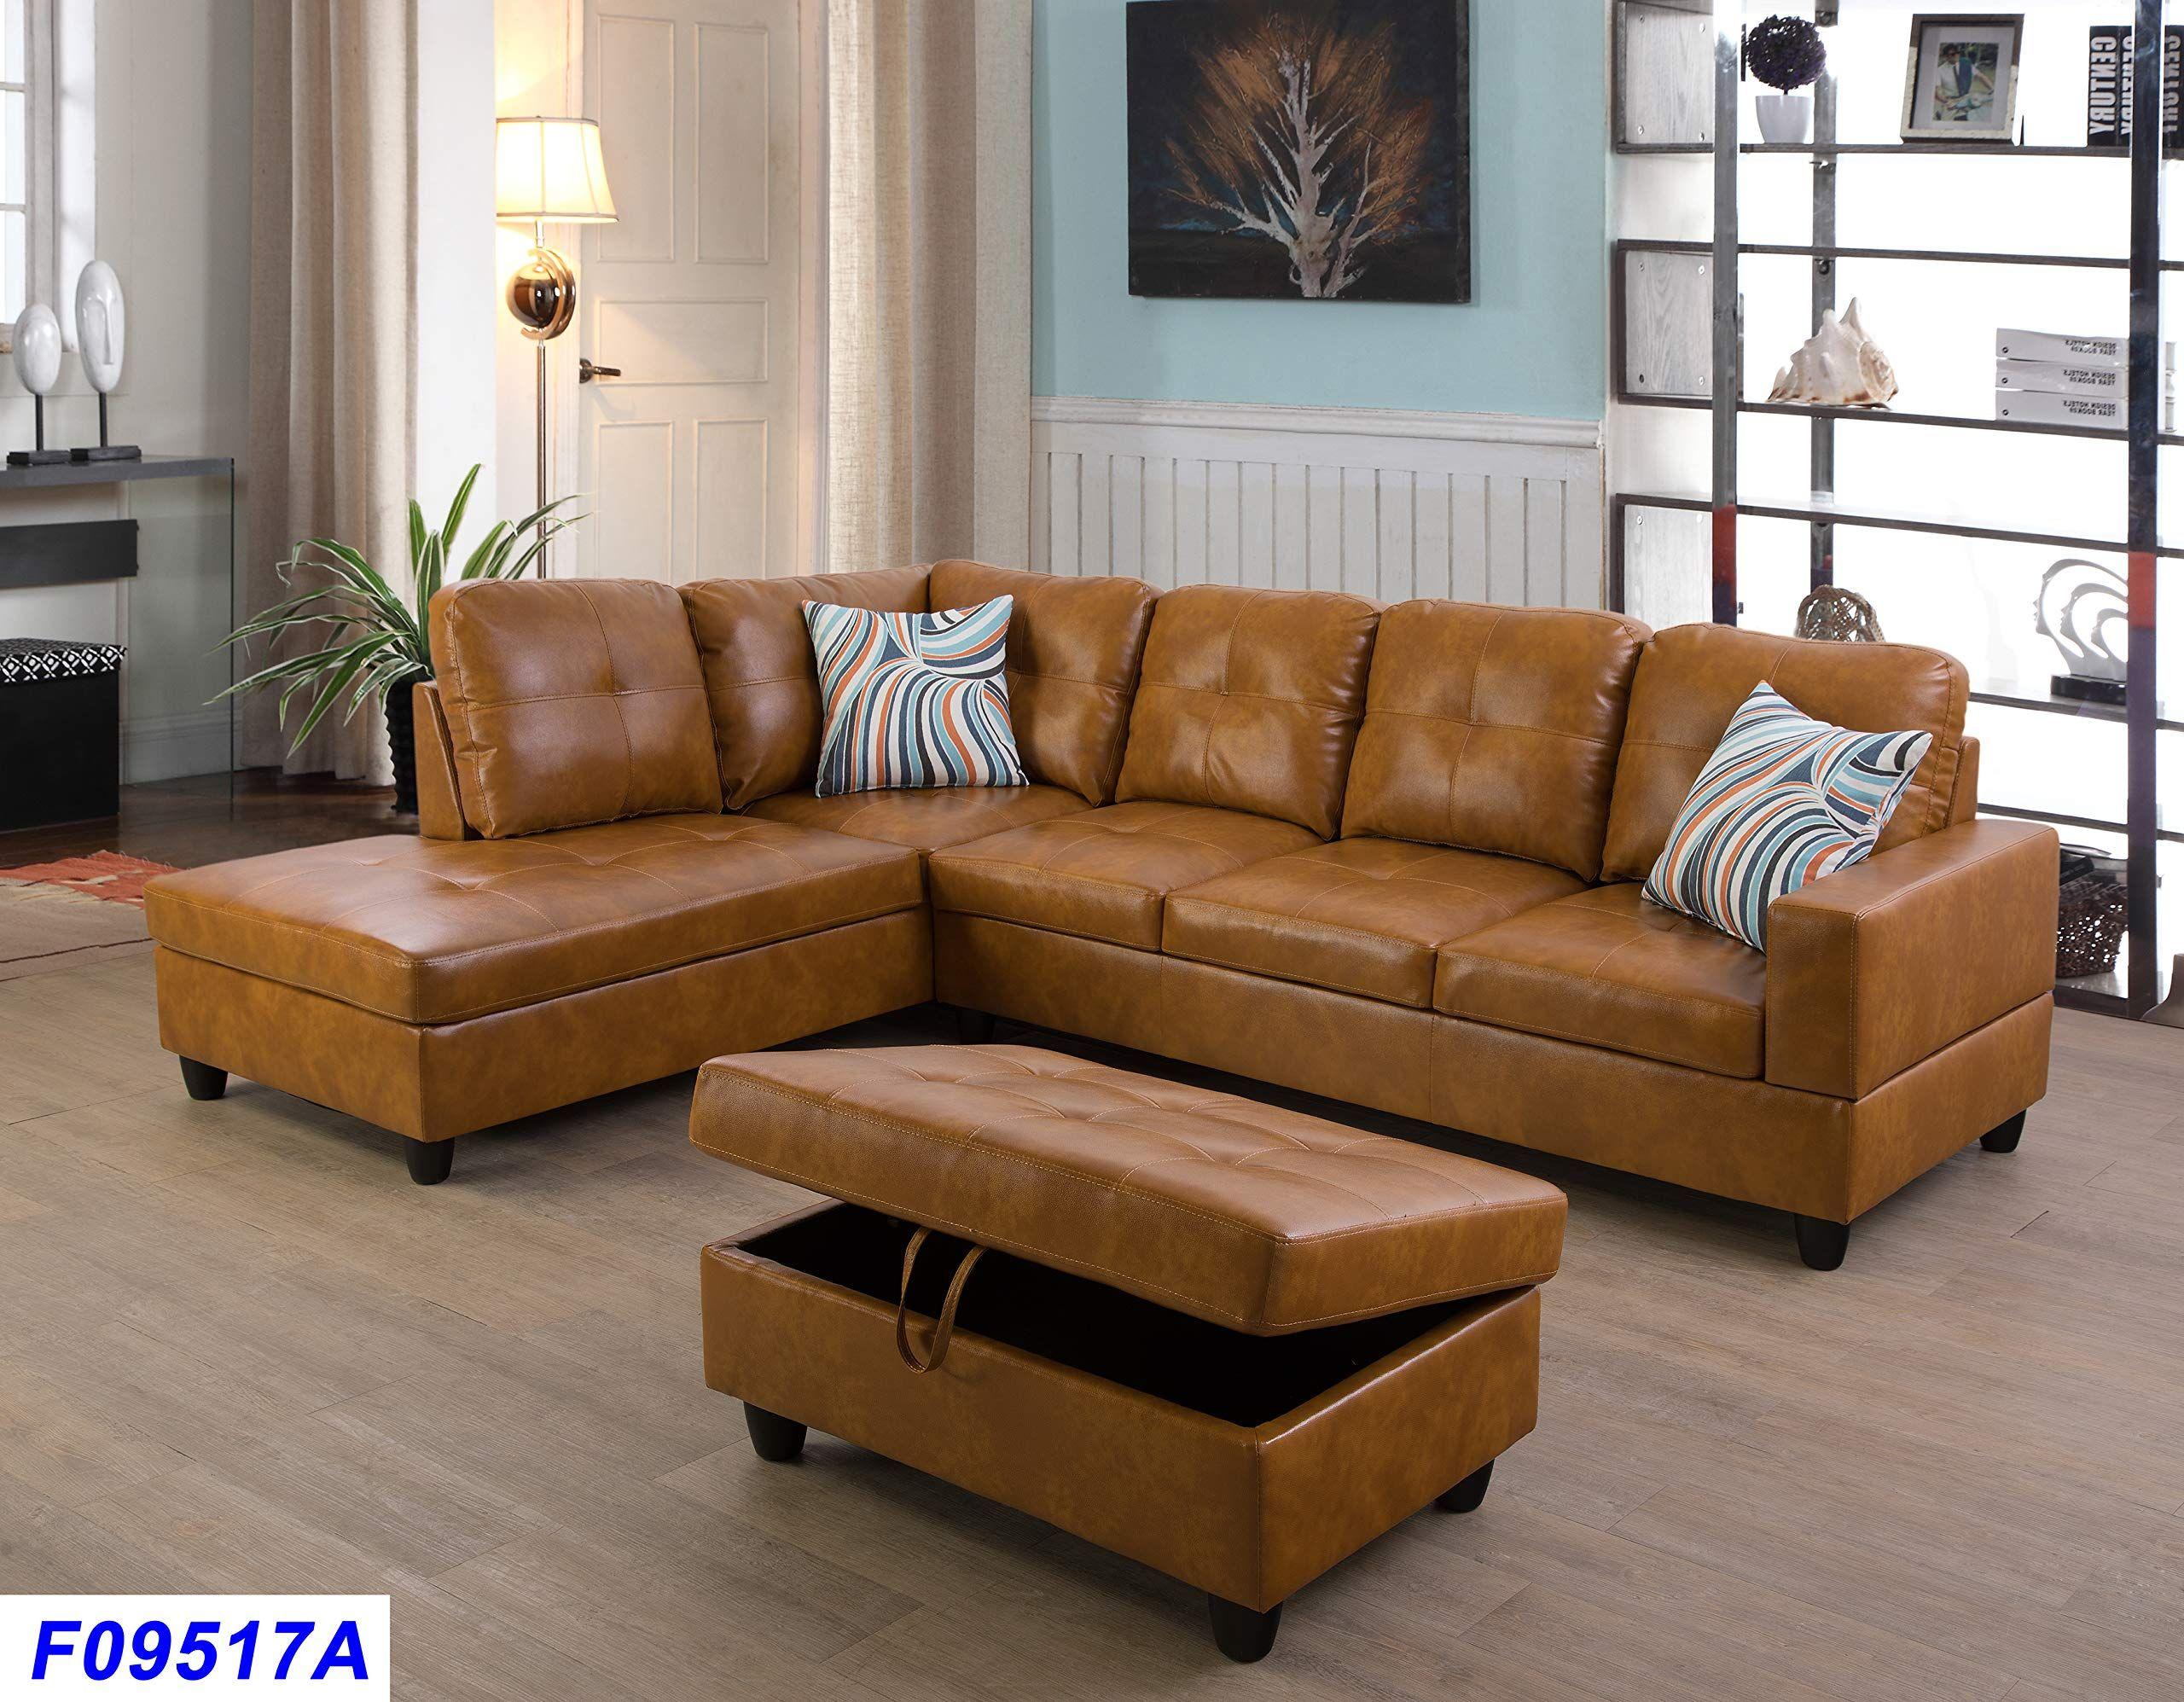 3pc Sectional Sofa Set